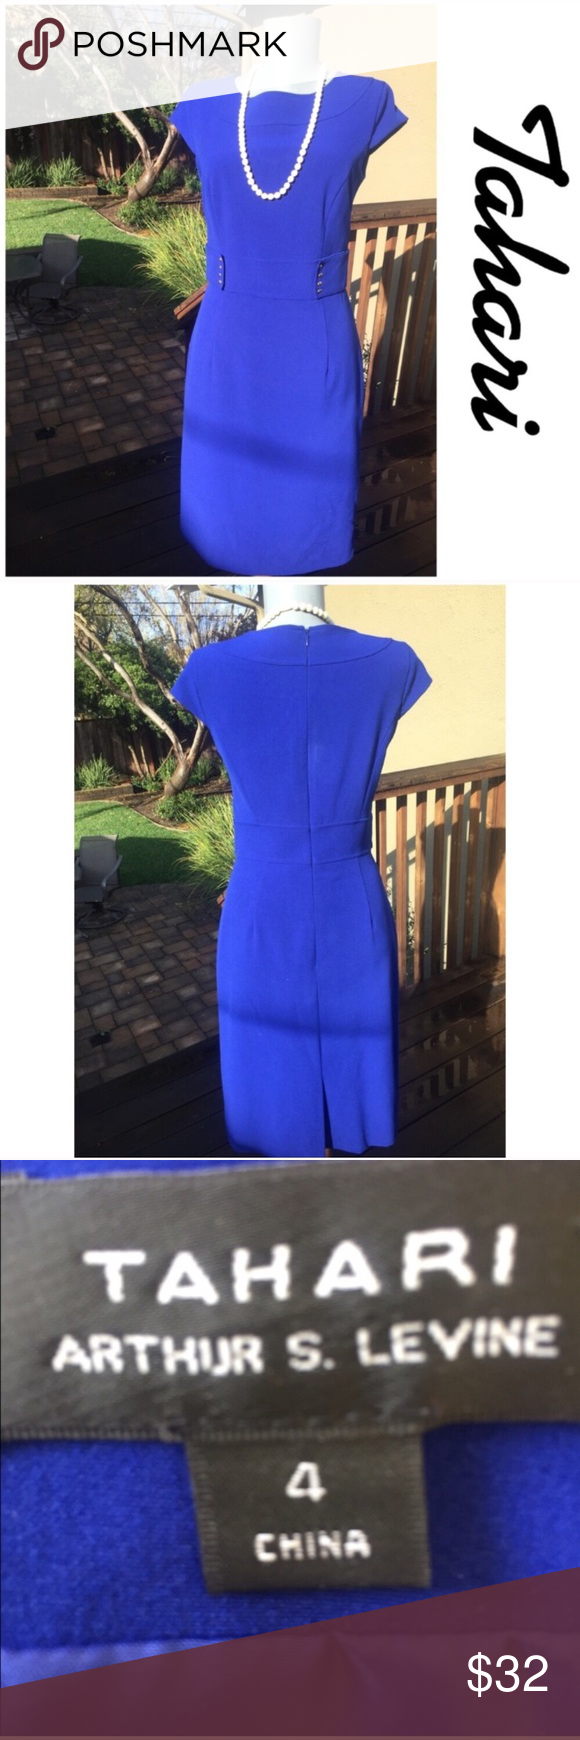 "Tahari Royal Blue Sheath Dress. Ultra Chic Tahari Royal Blue Sheath Dress. Ultra Chic. Very good condition.  Flat lay measurements. Between under arms  17"".  Waist 28"".  Hips 36"". Length 37"".  Gorgeous. Tahari Dresses"